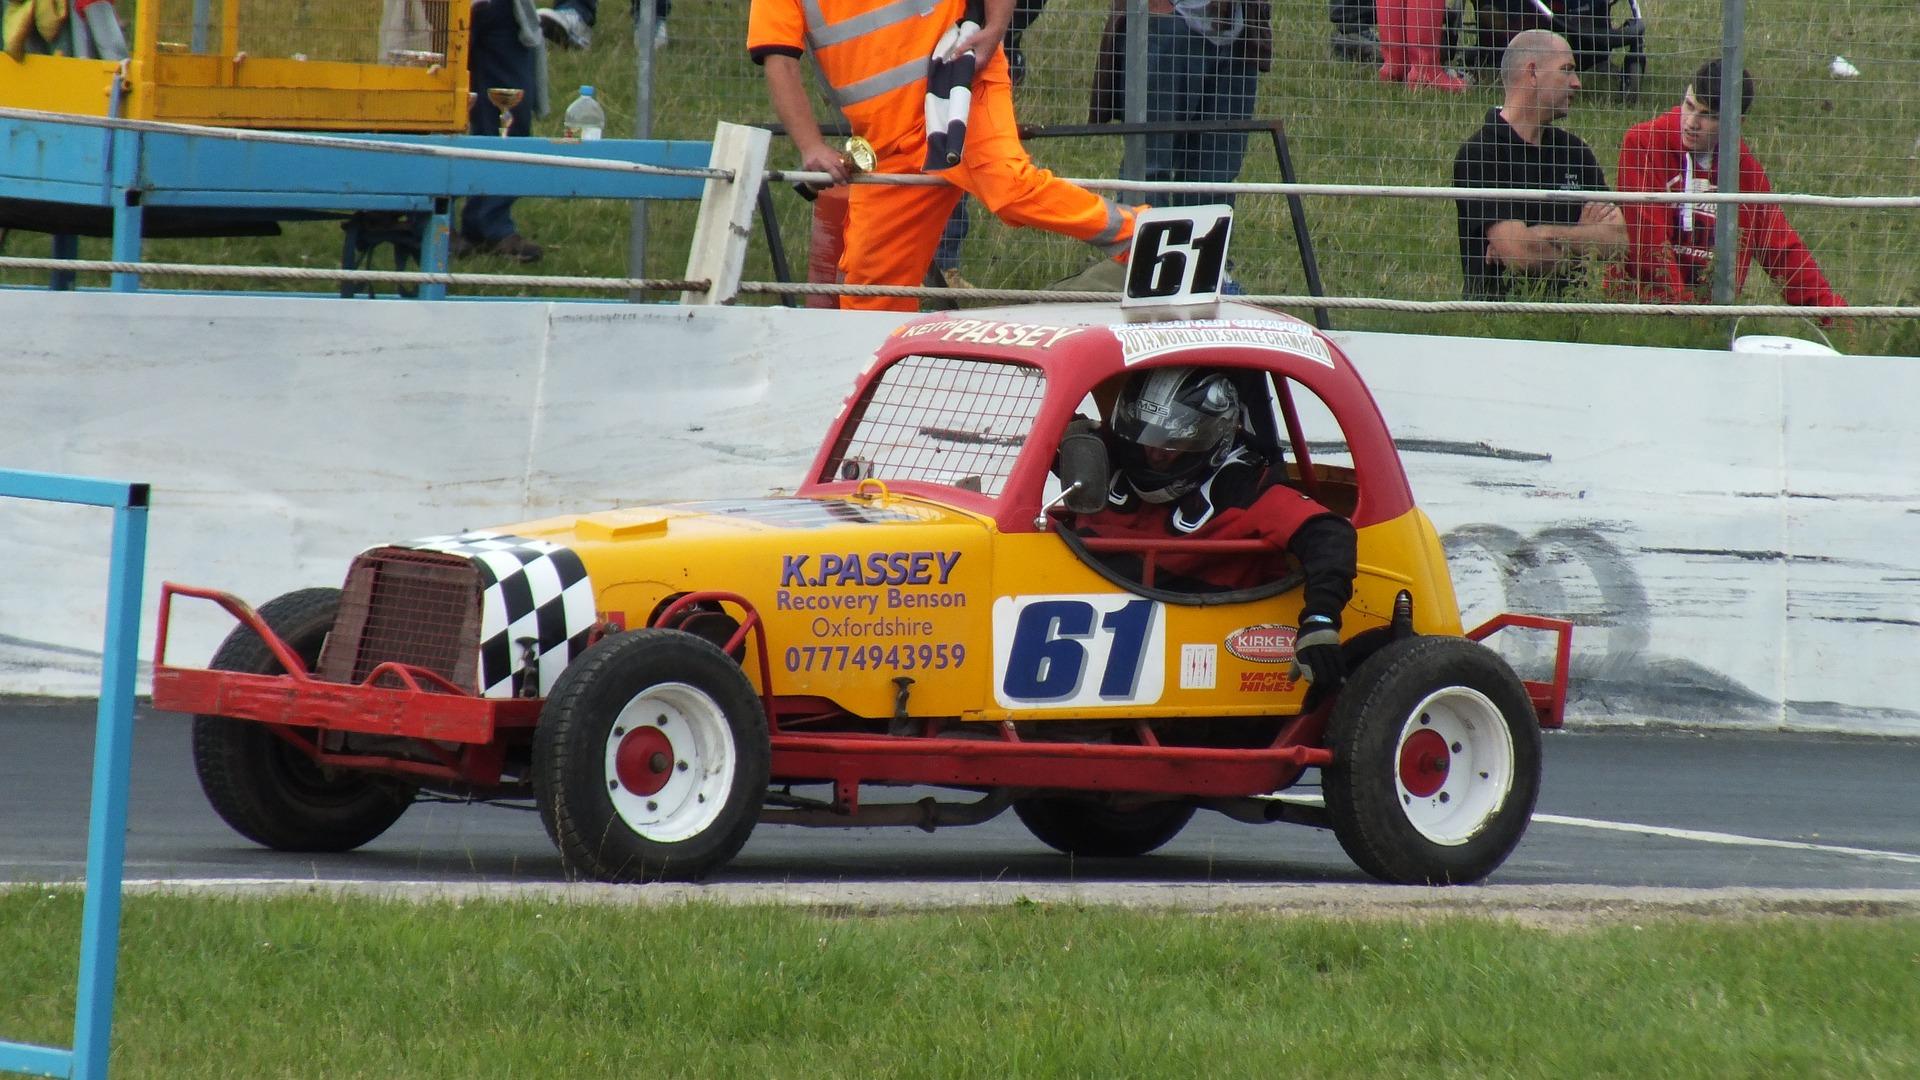 Stock car racing at Redruth